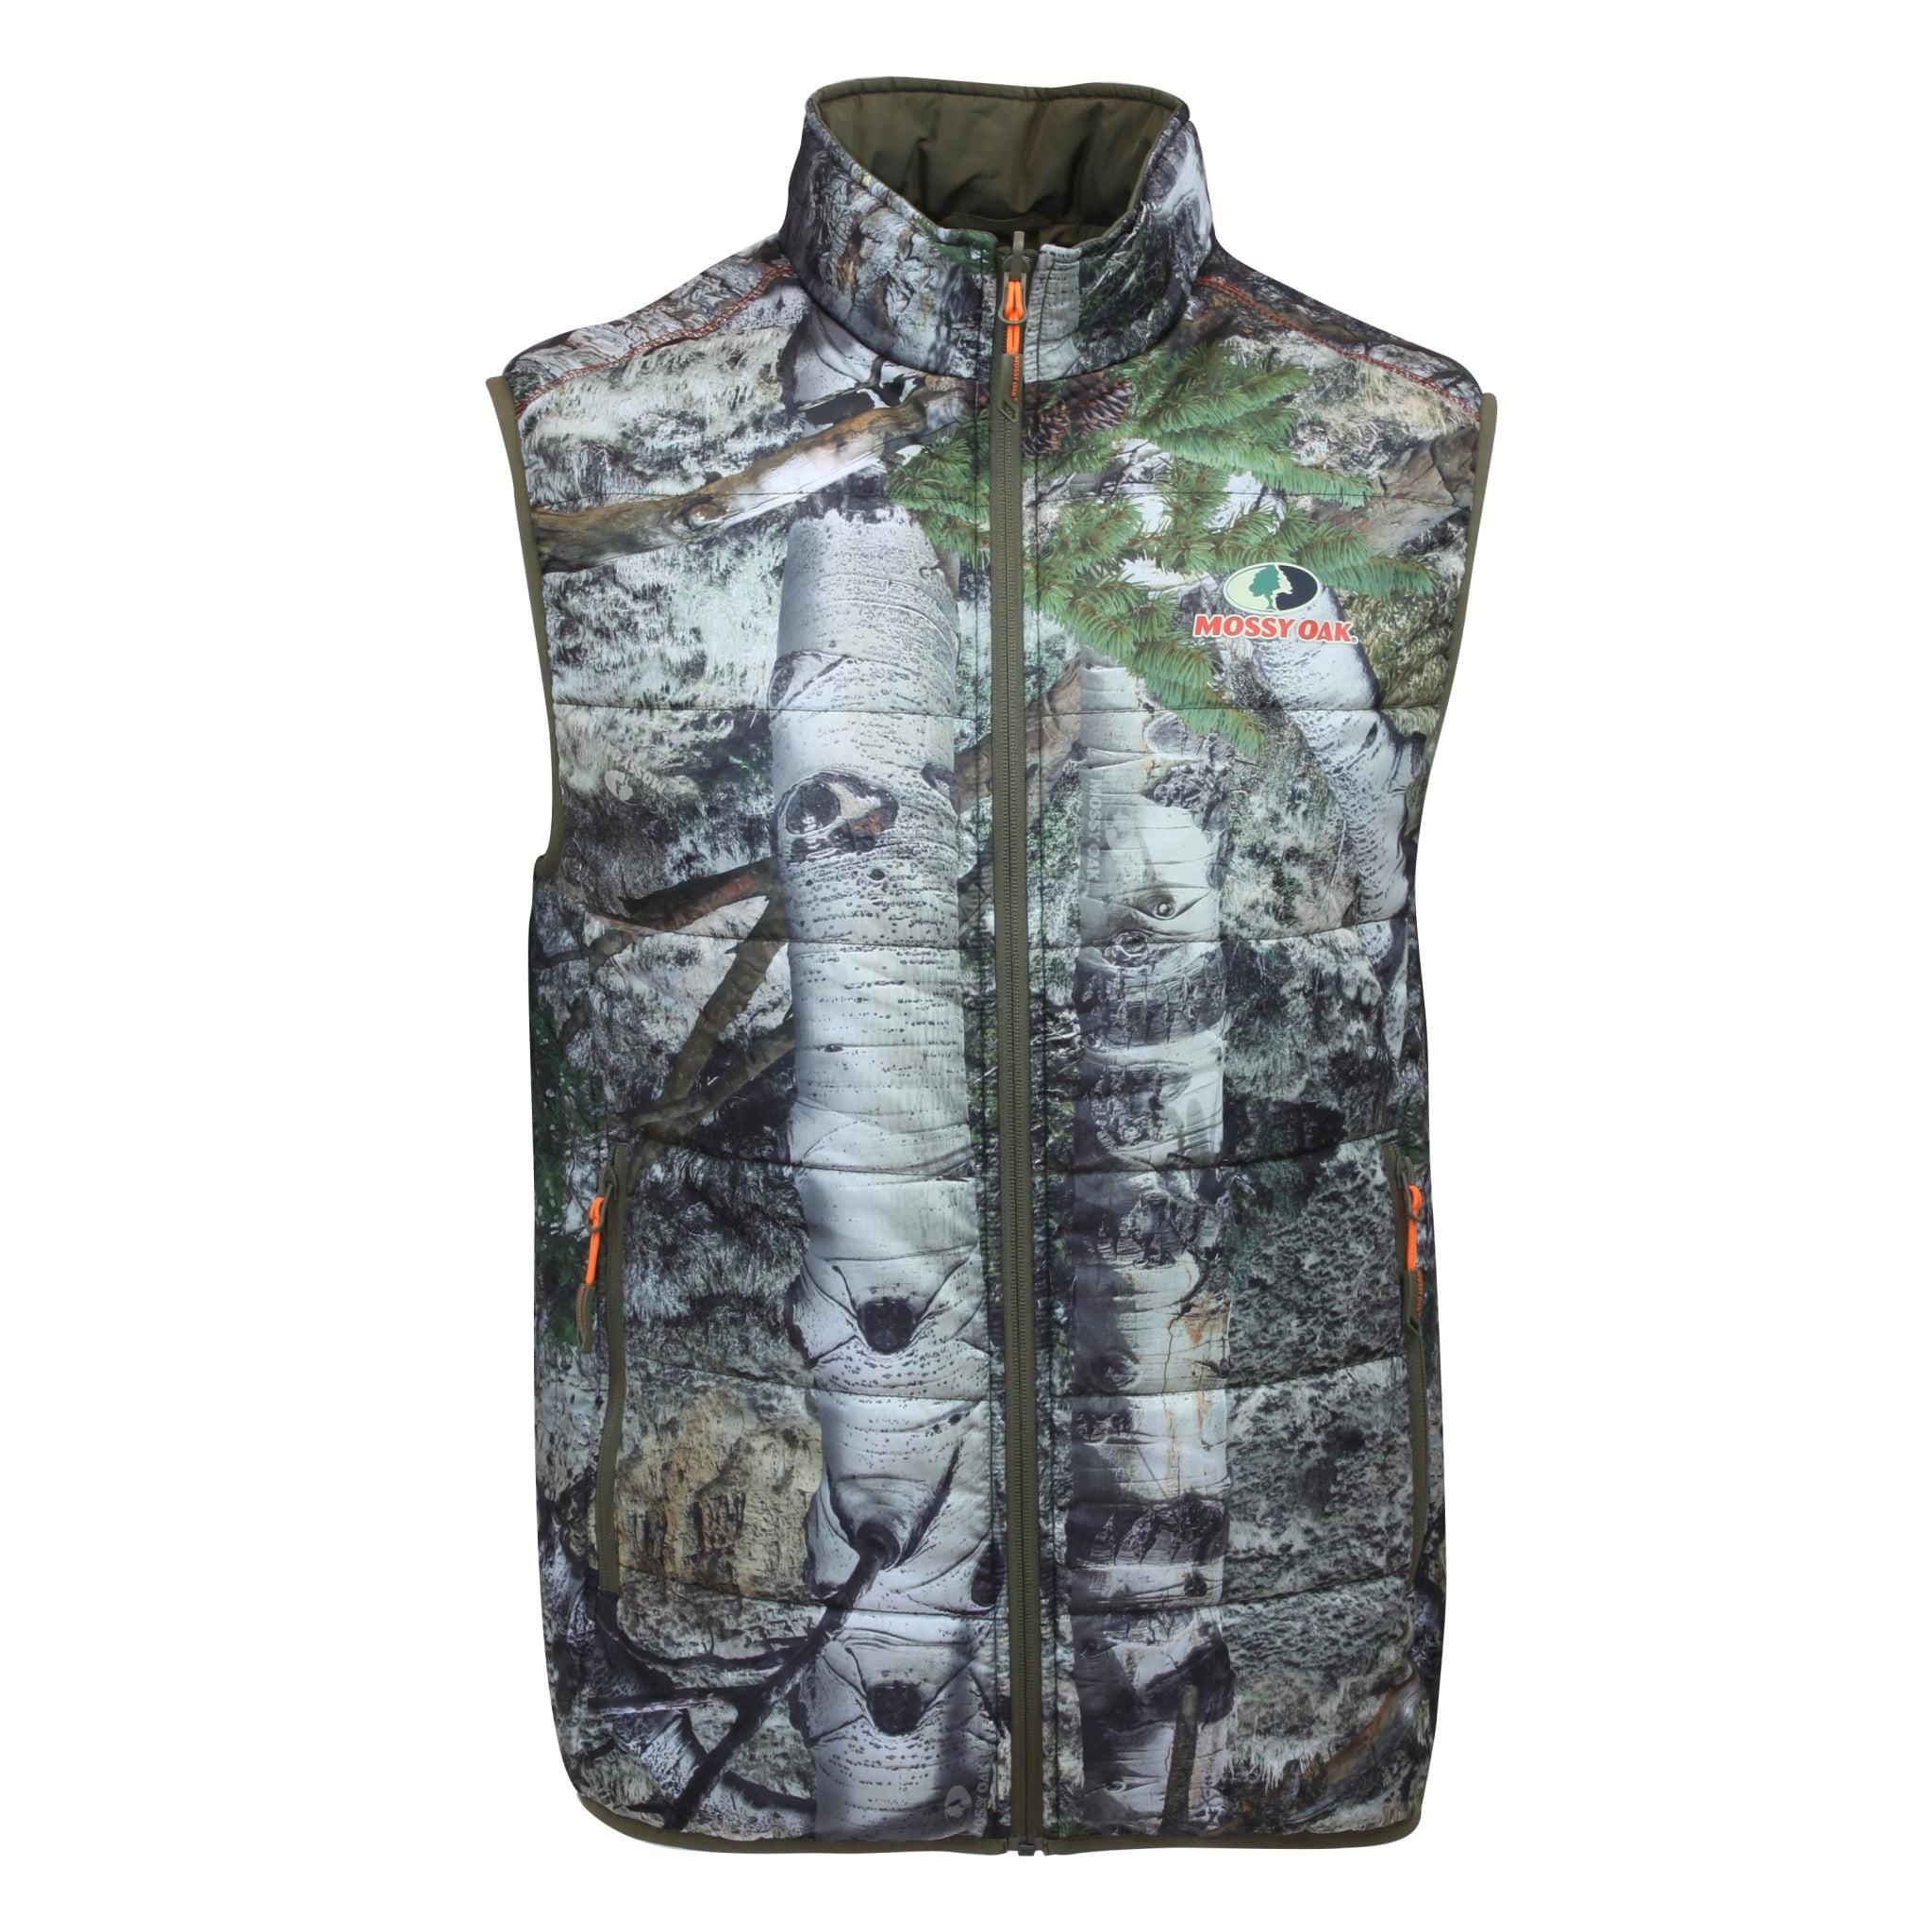 Mossy Oak Men's Insulated Vest